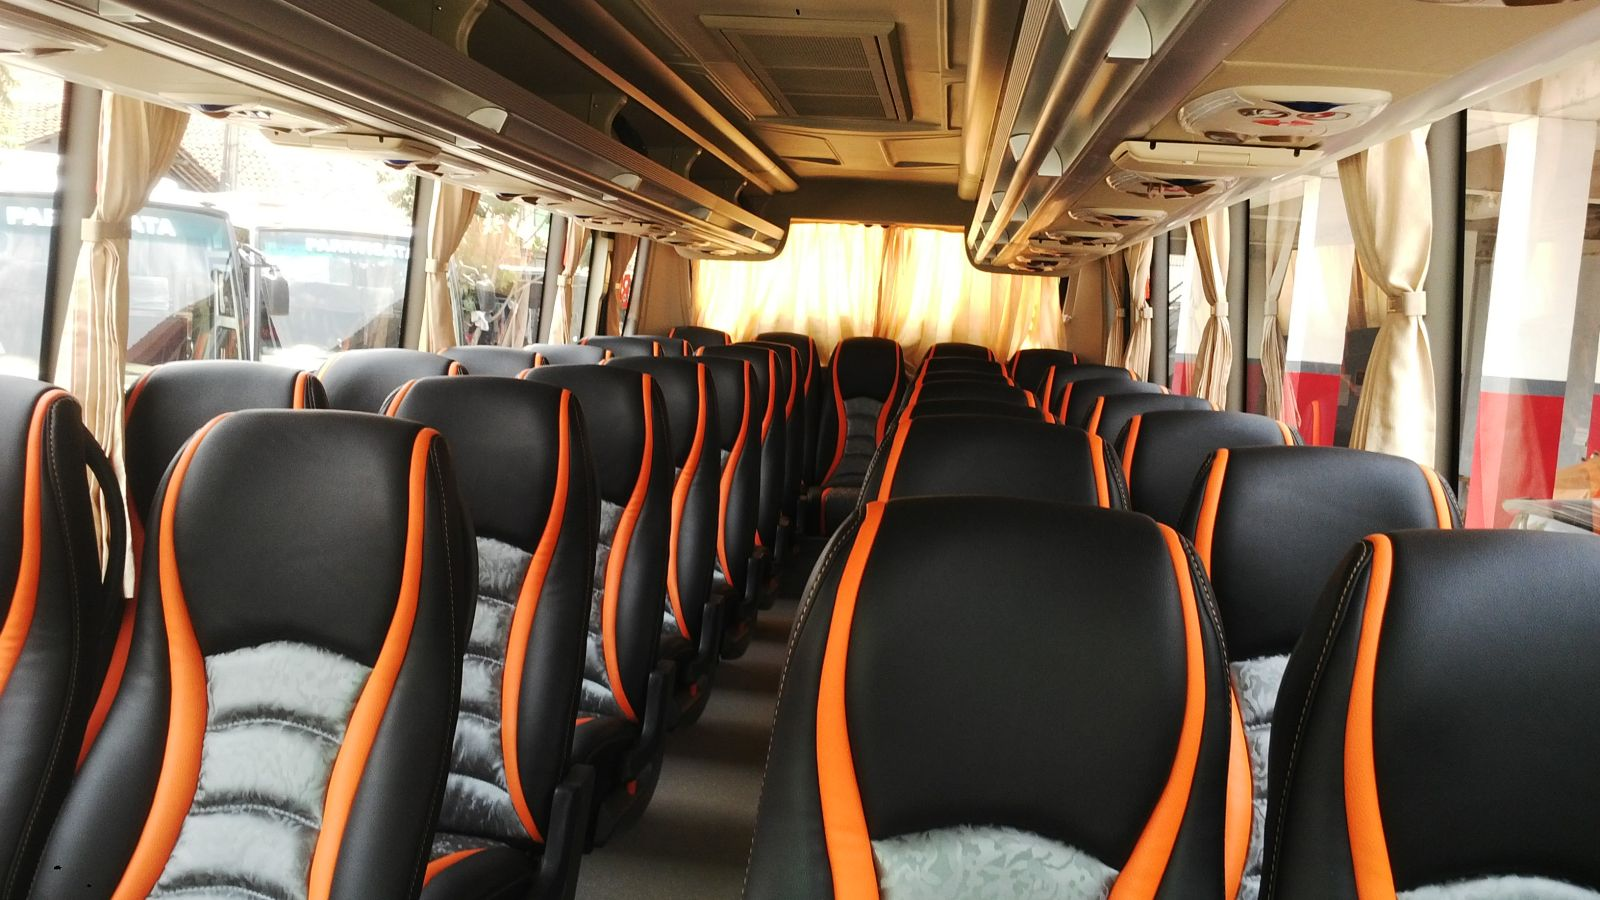 sewa-bus-mega-citra-pariwisata